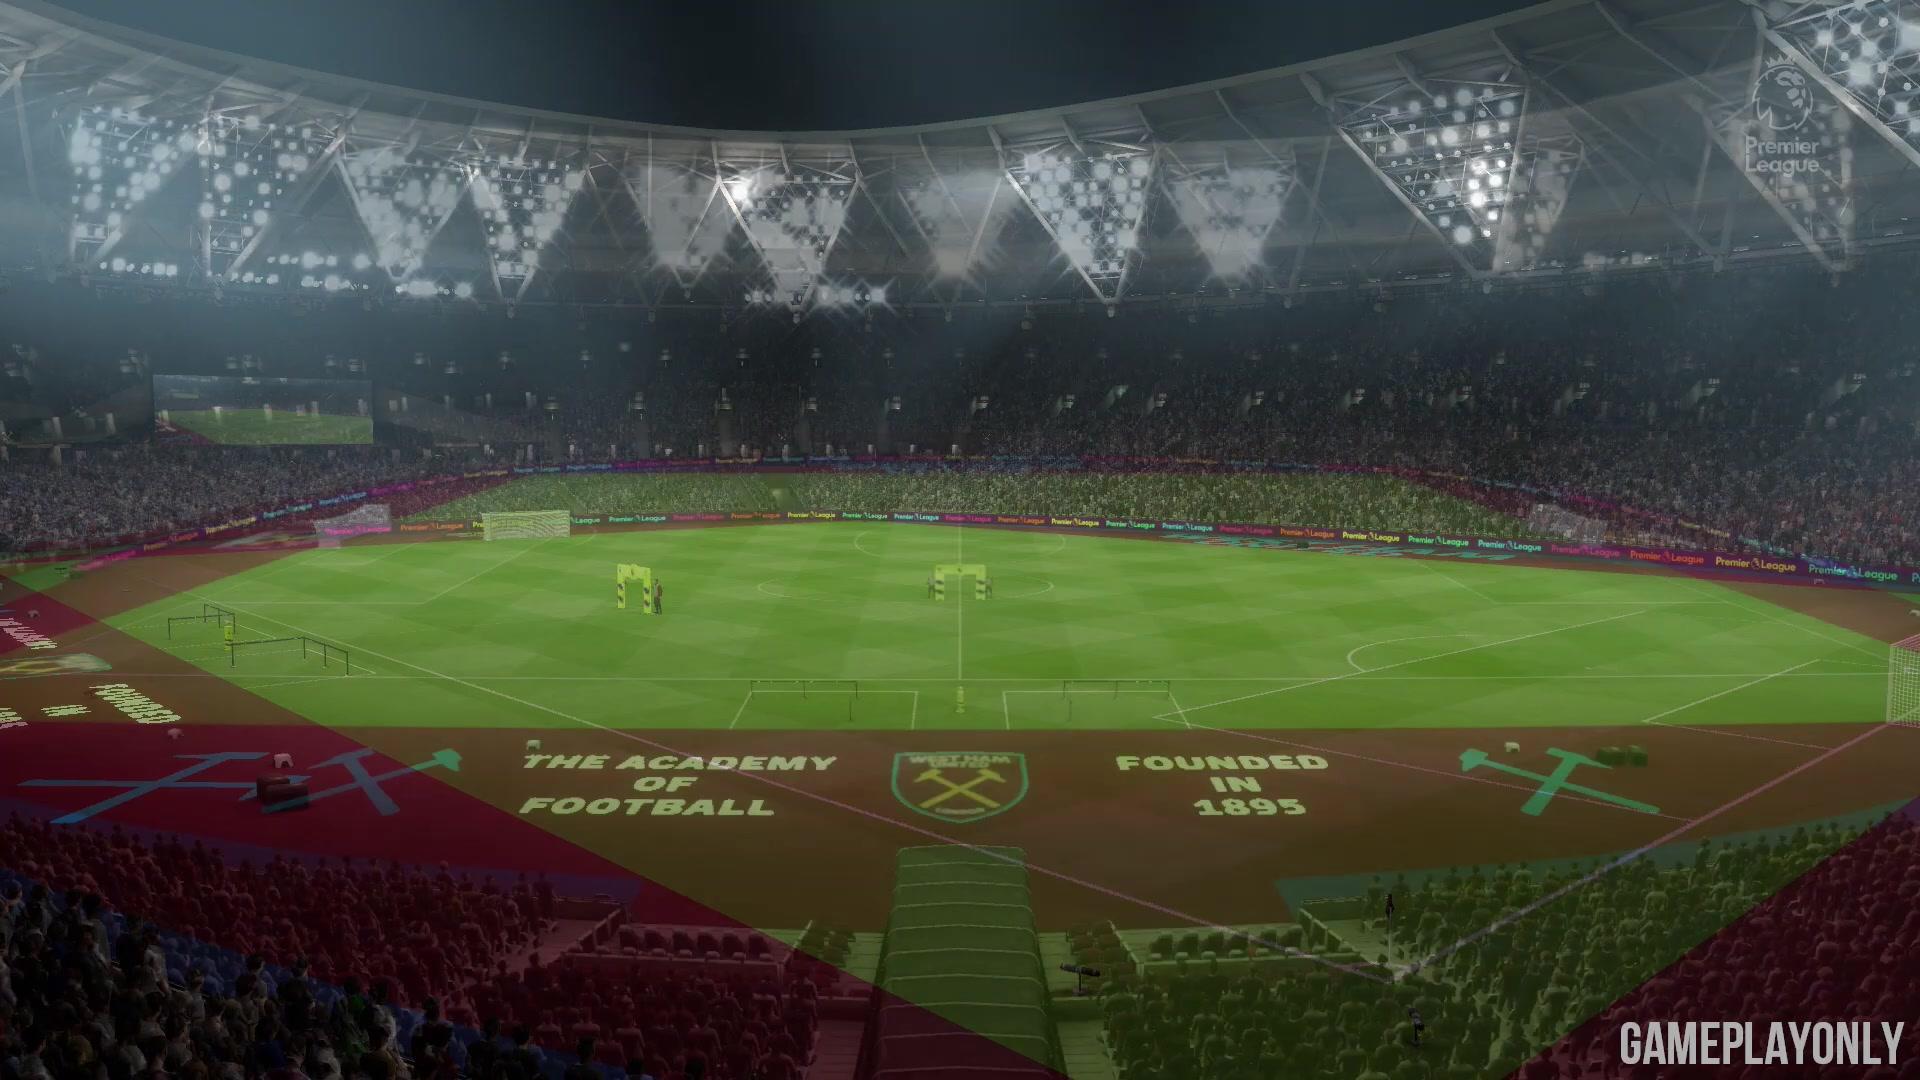 《FIFA 20》游戏画面表现出色,将于9月24日正式上线